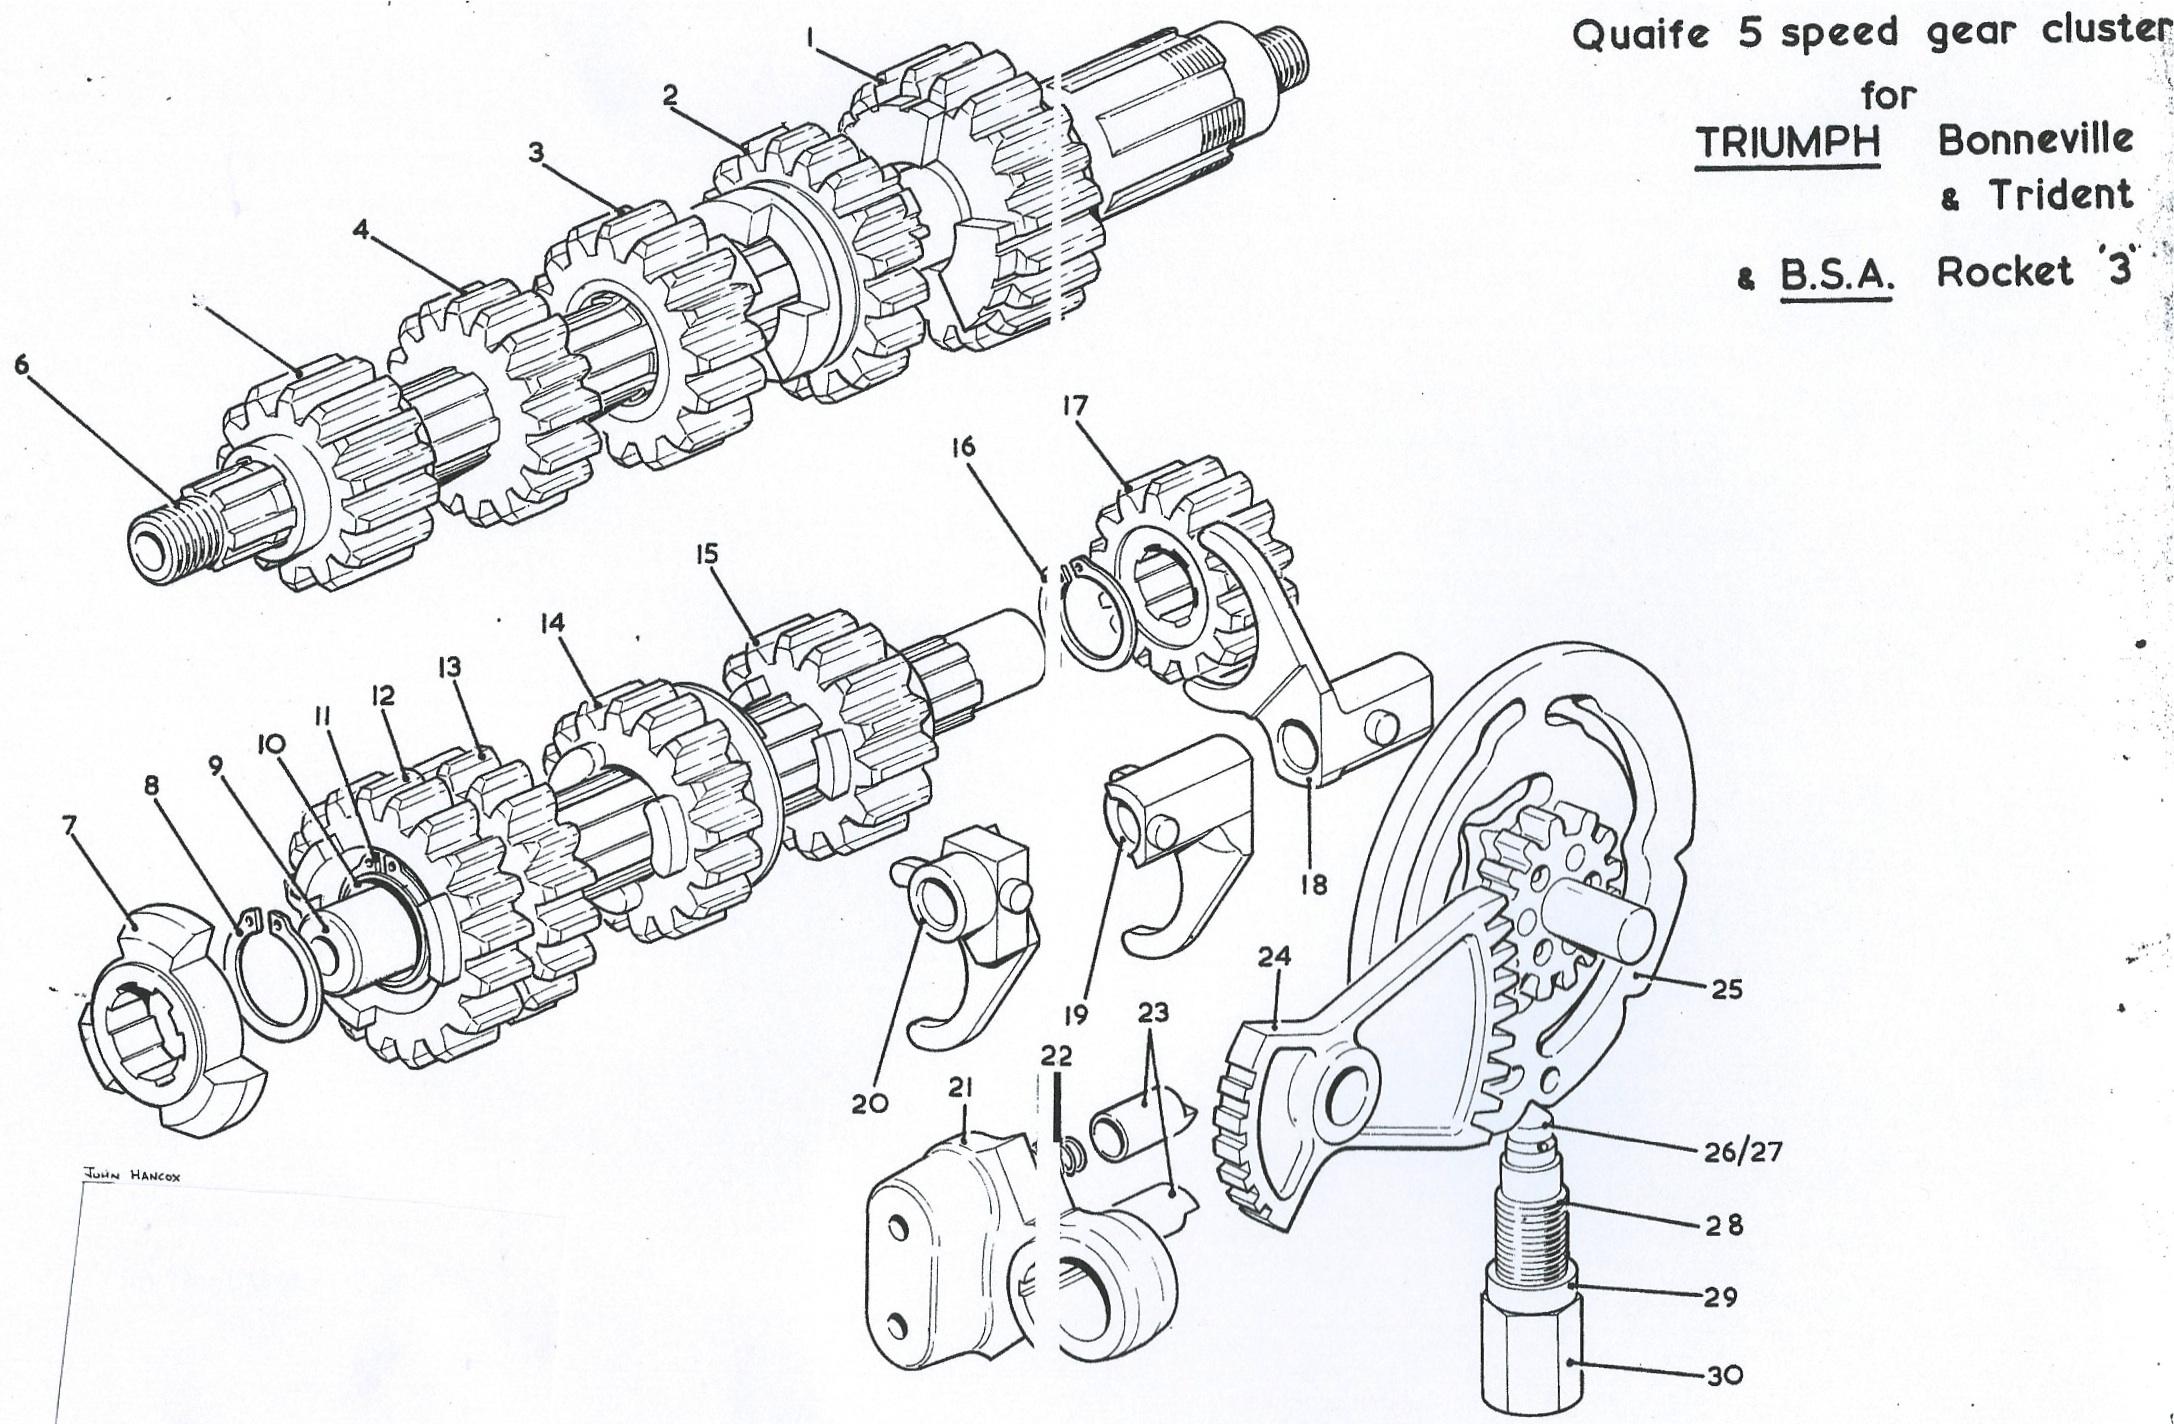 dimarzio wiring diagram 2 way uk vintage super distortion fender